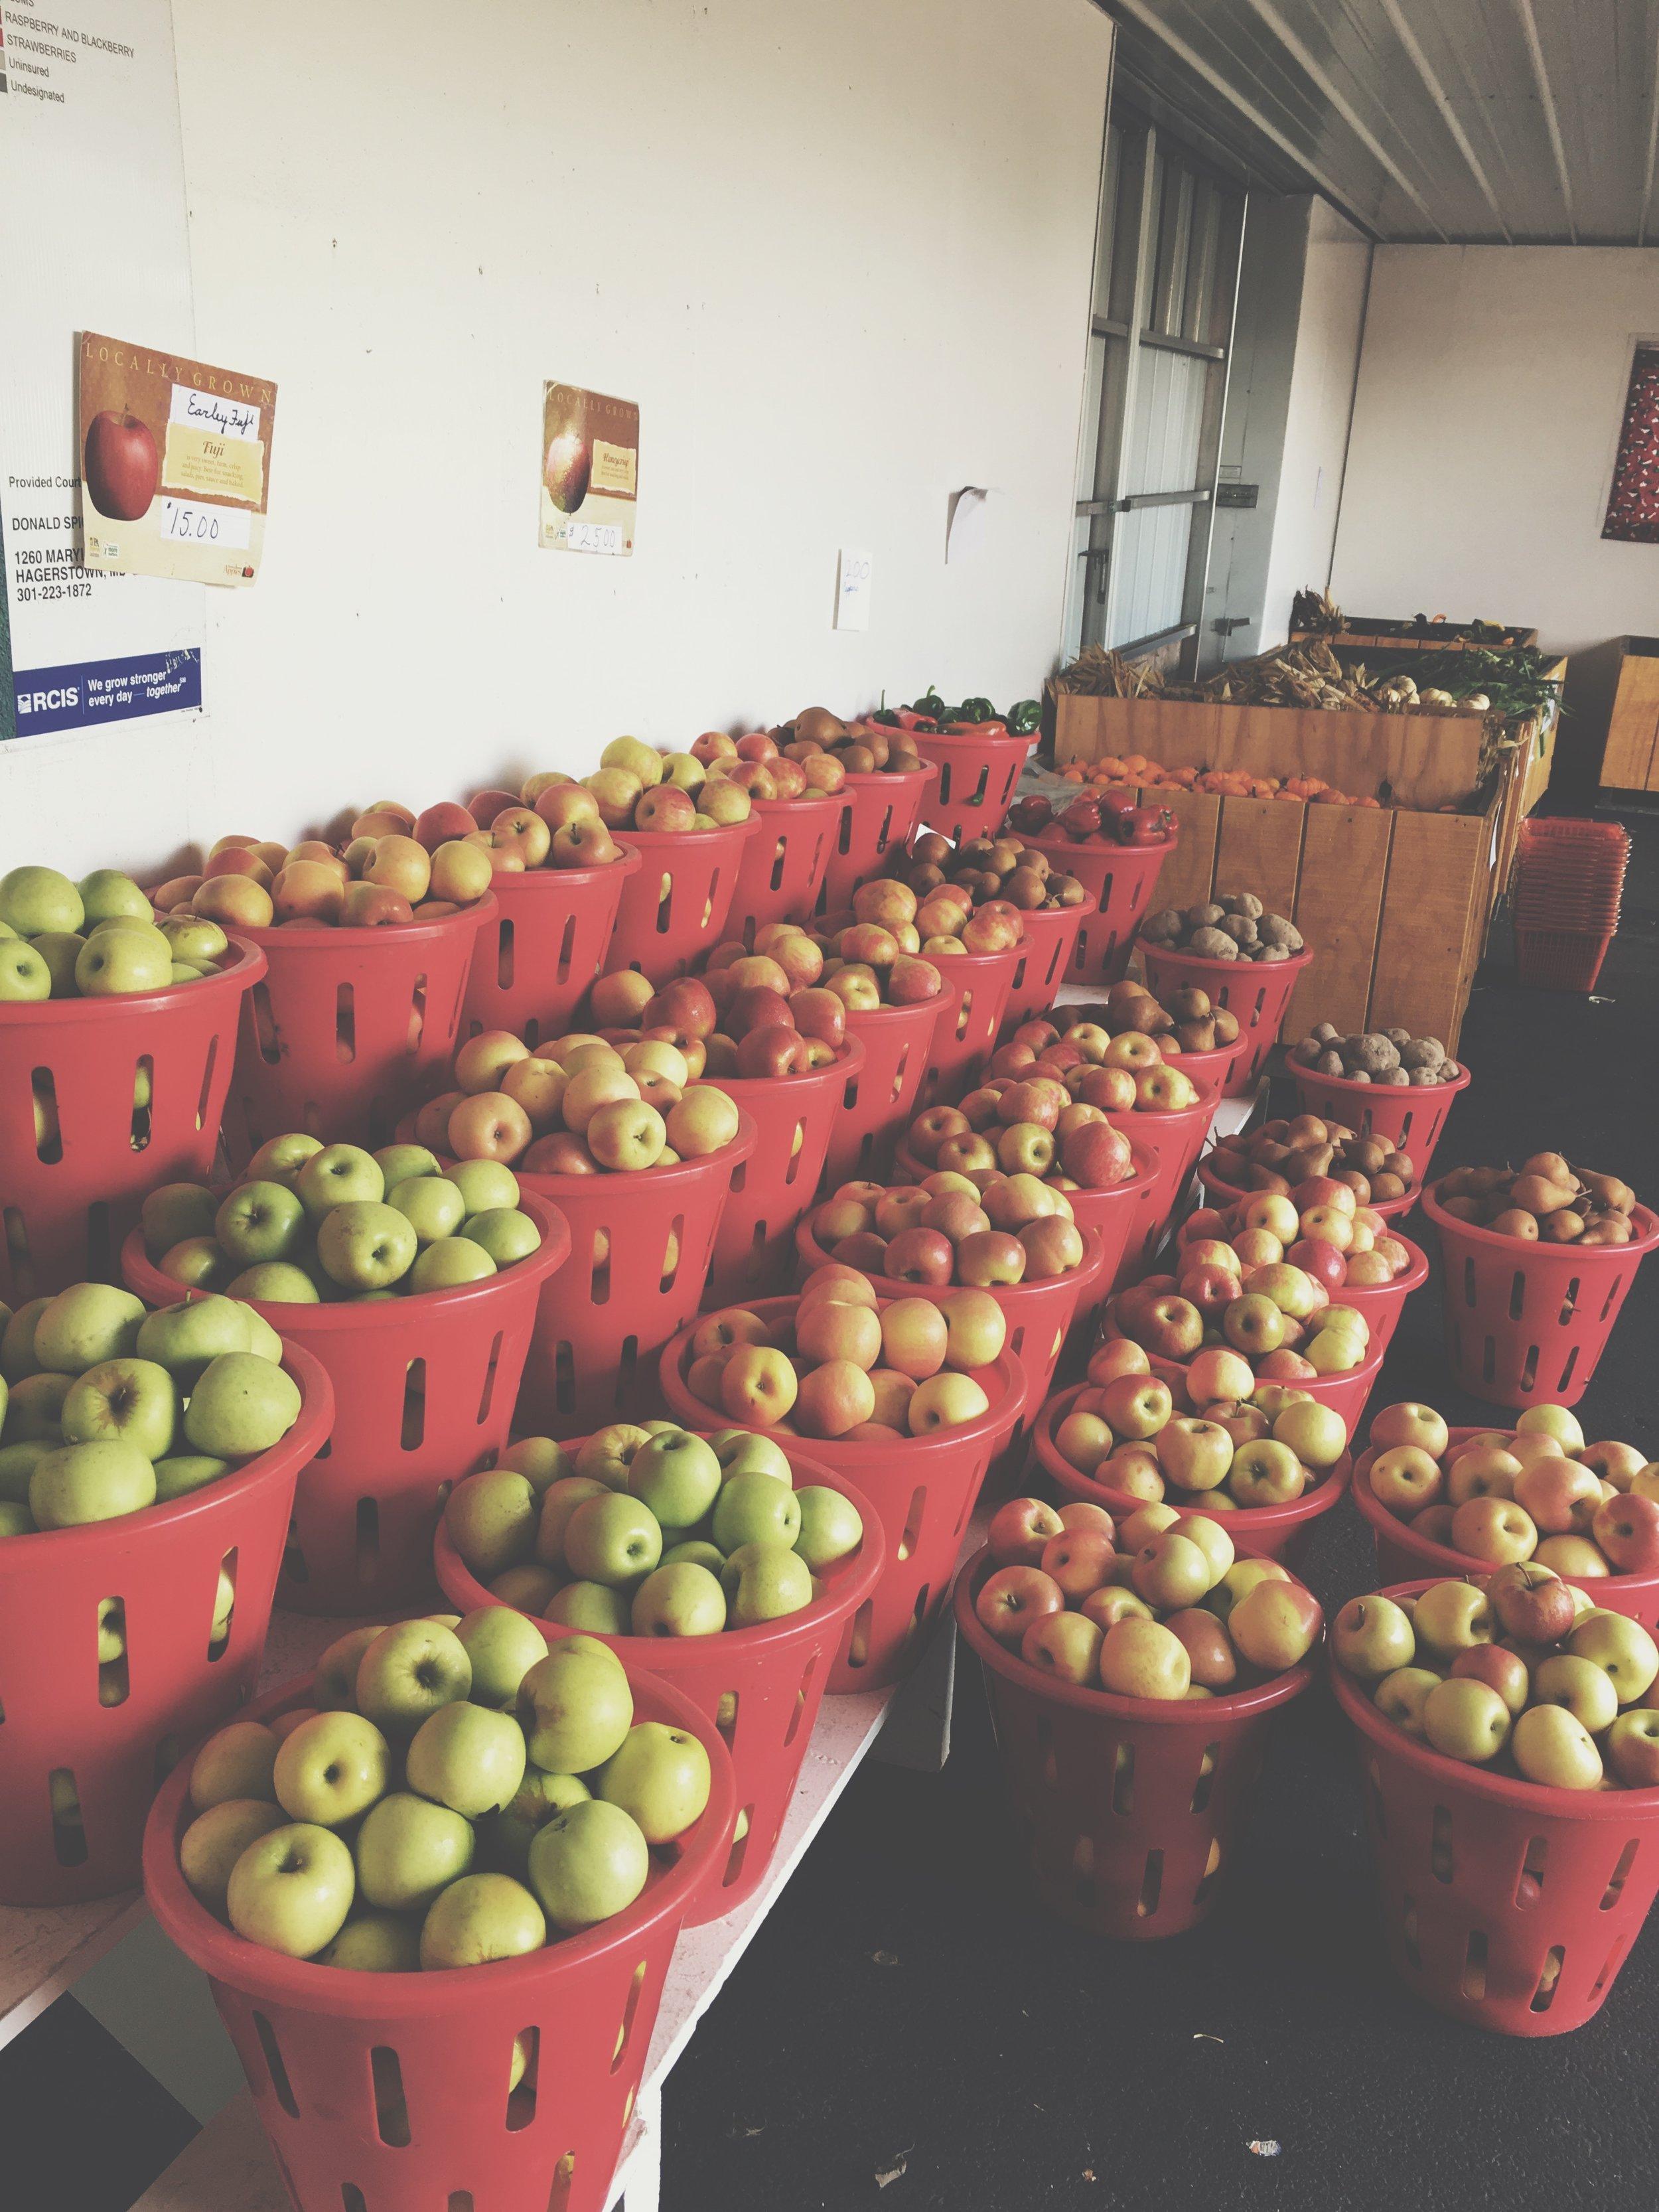 - We also have plenty of apples